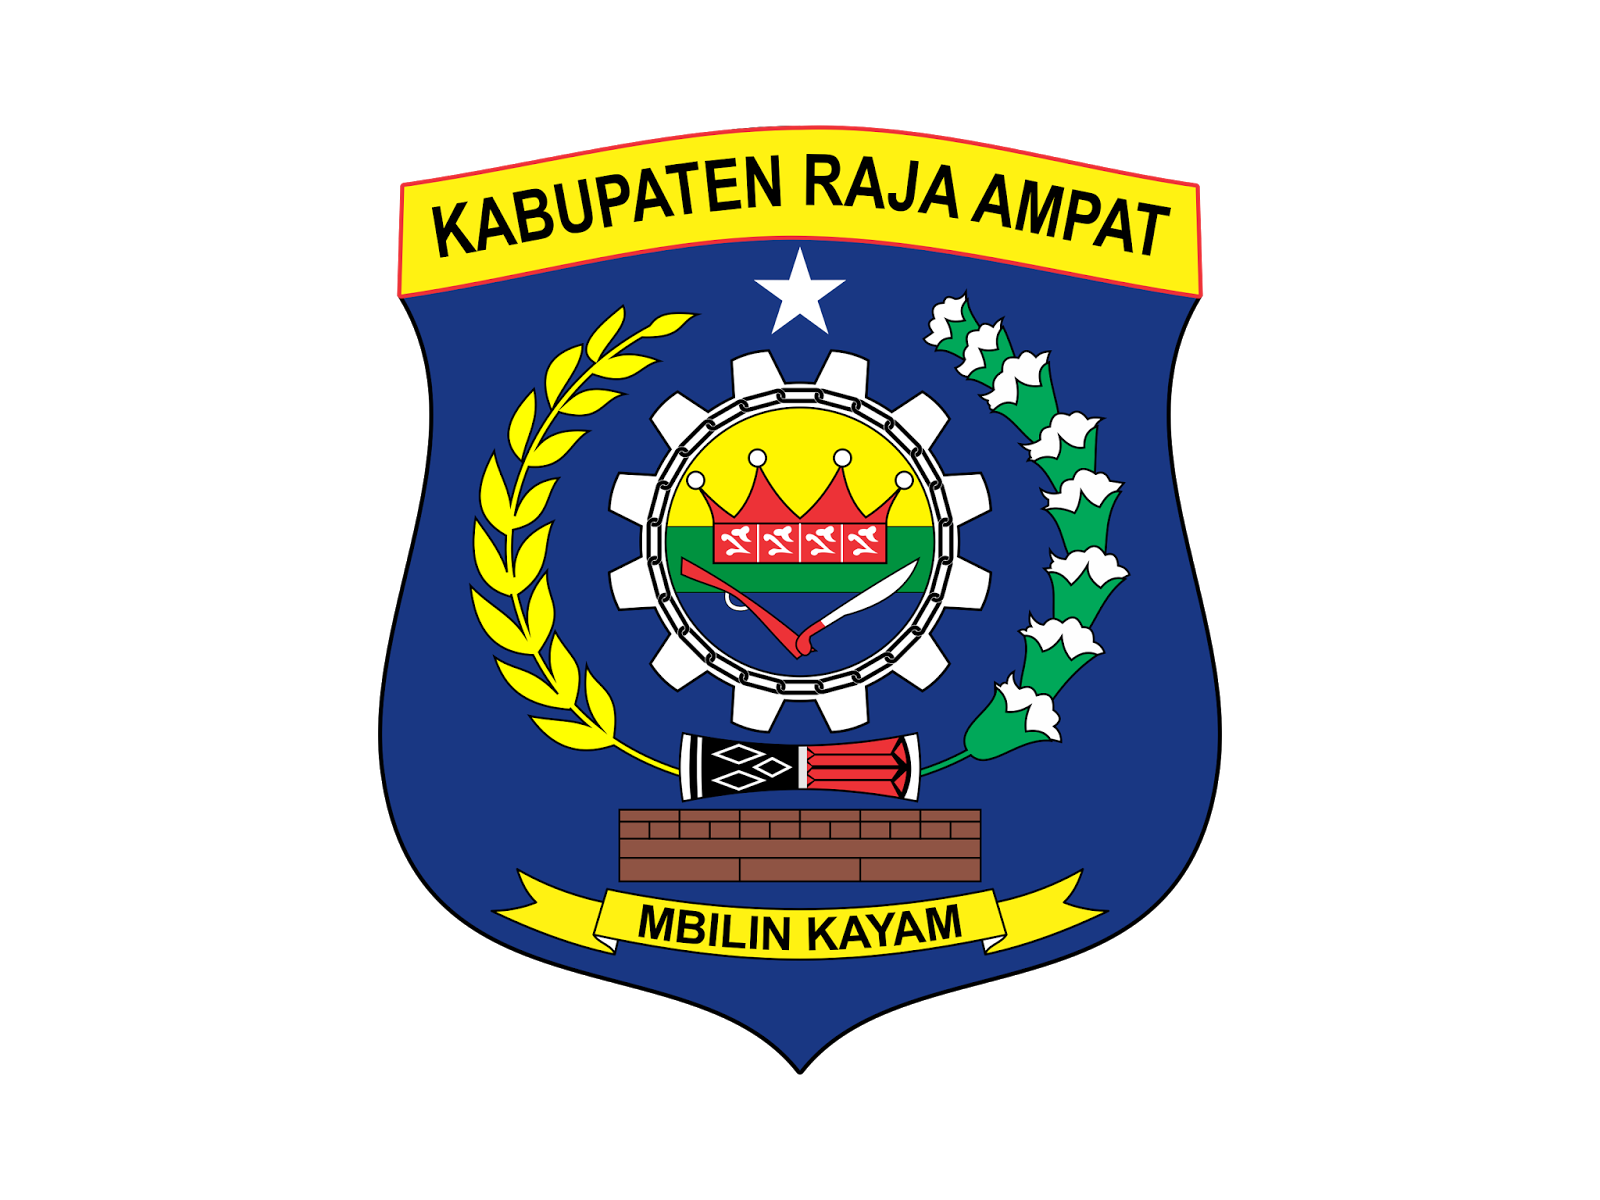 Logo Kabupaten Raja Ampat Vector Cdr Png Hd Biologizone